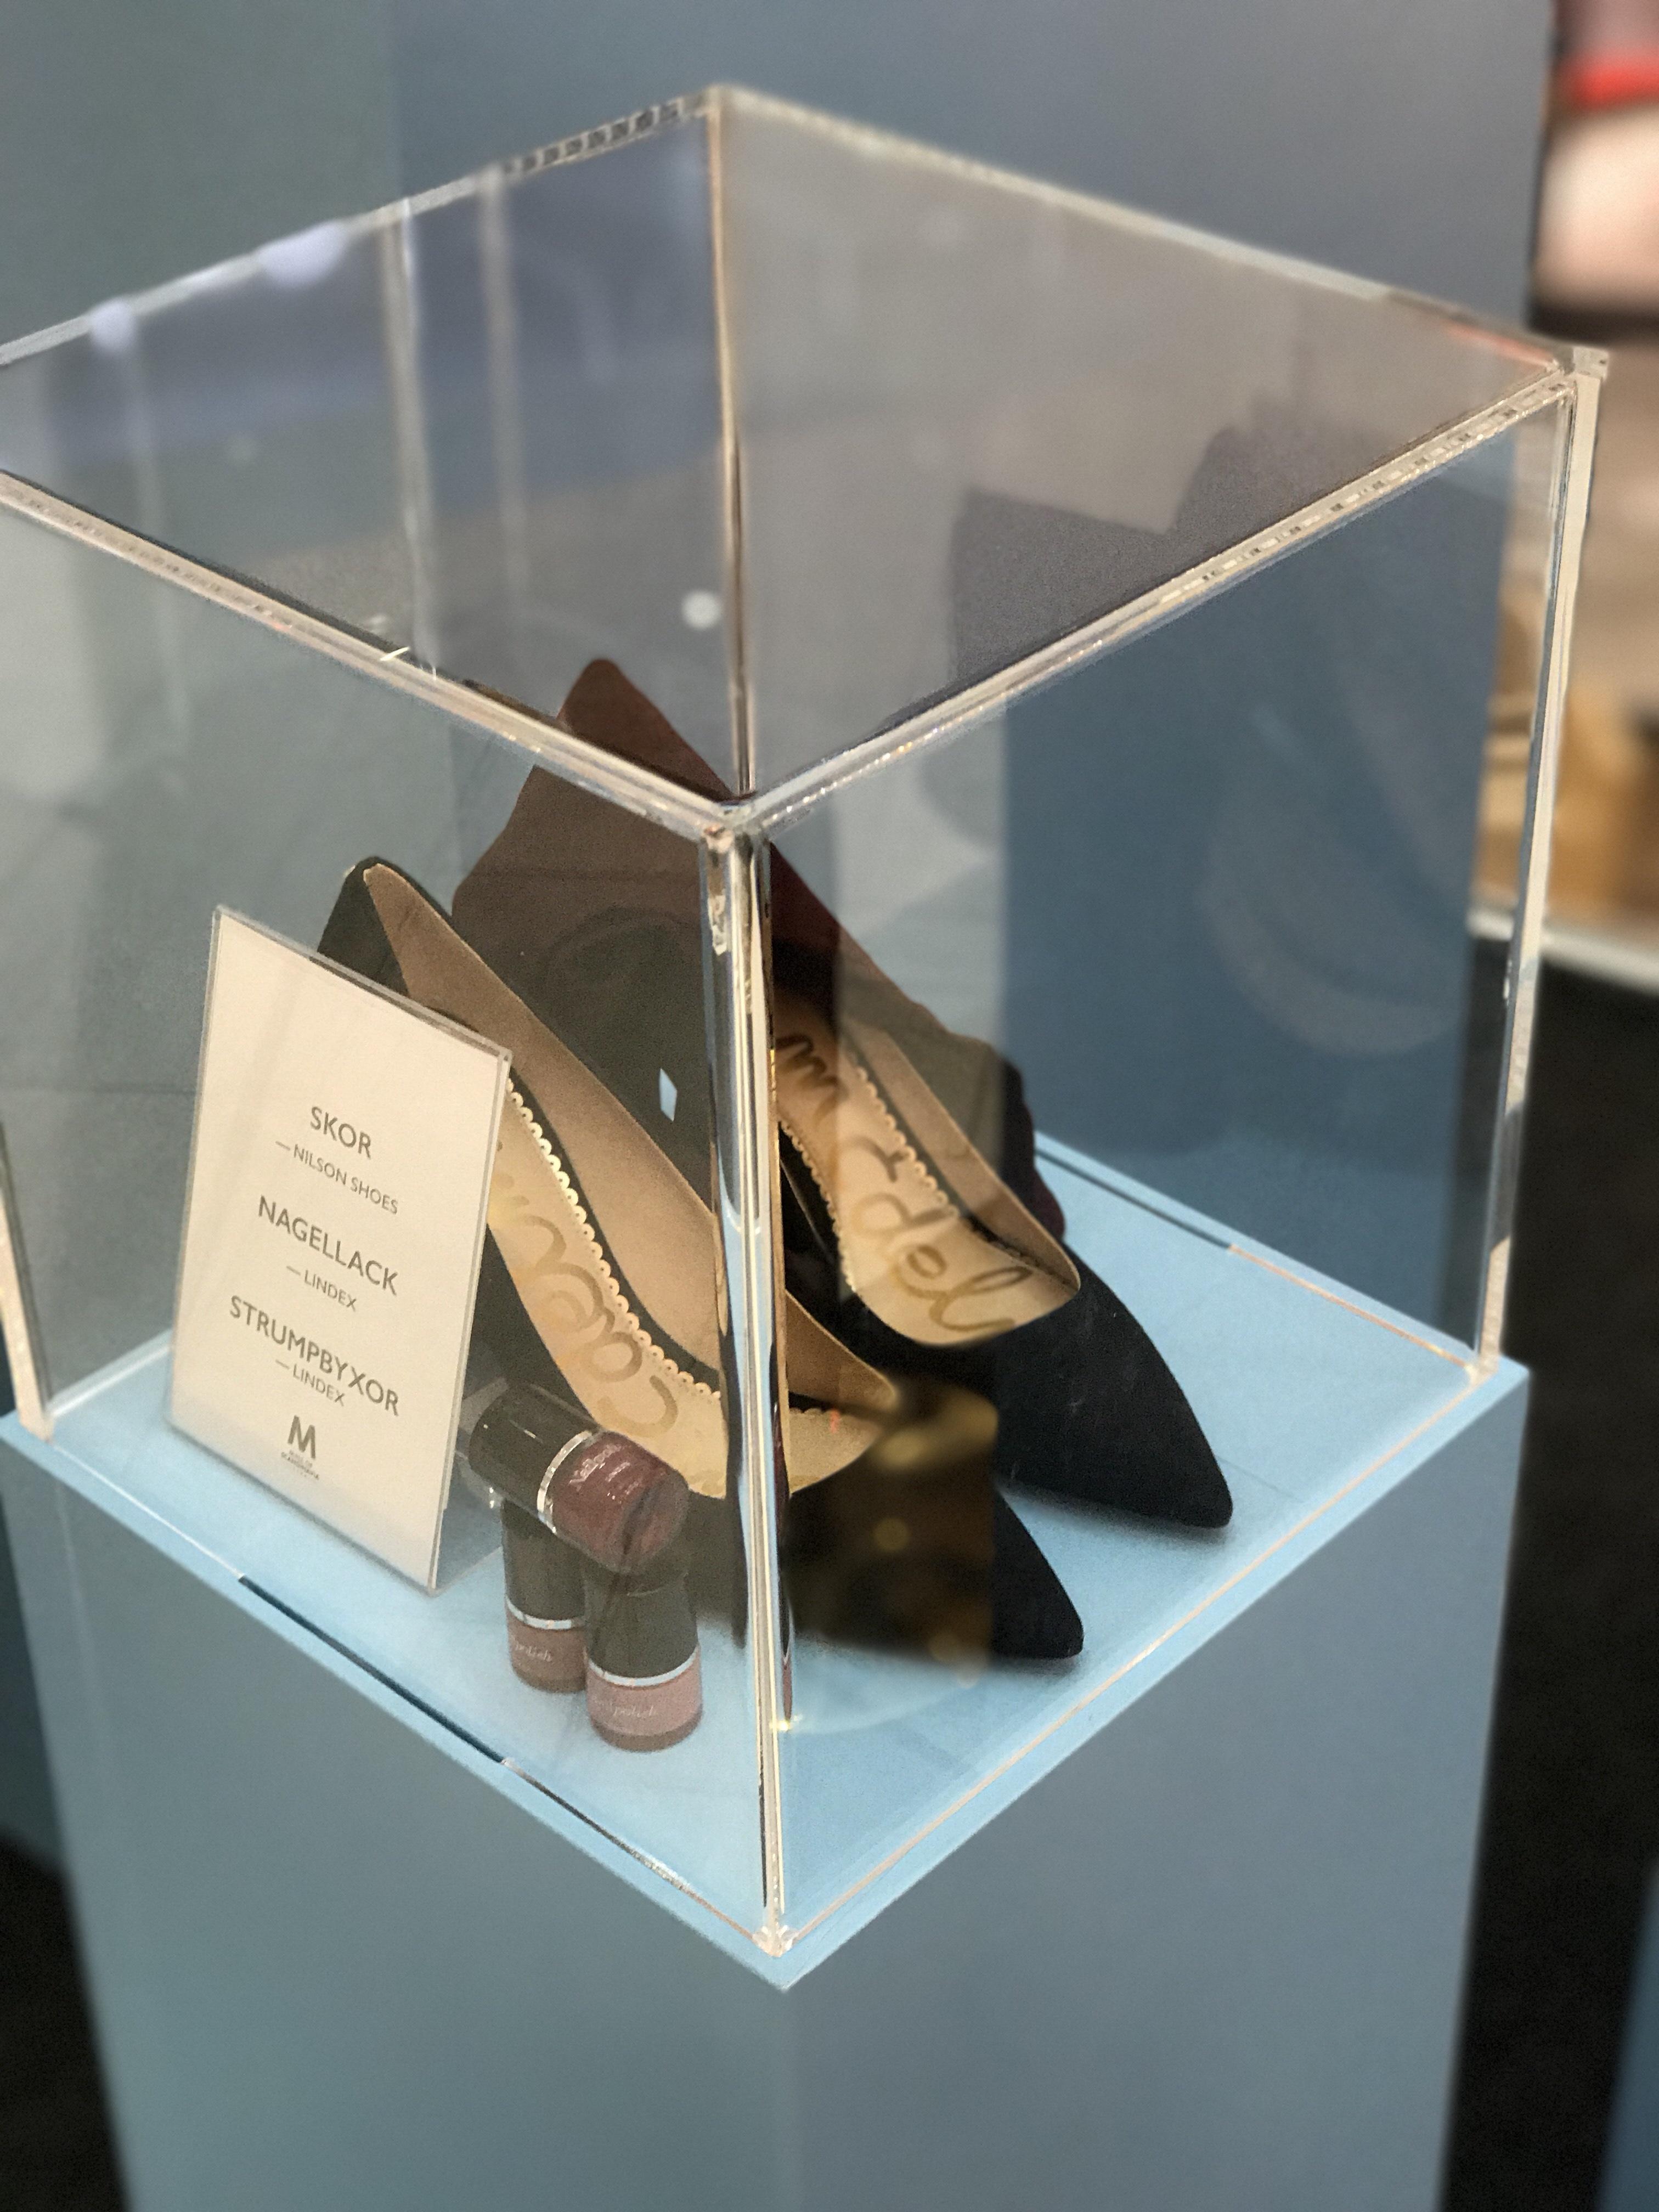 nilson shoes mall of scandinavia